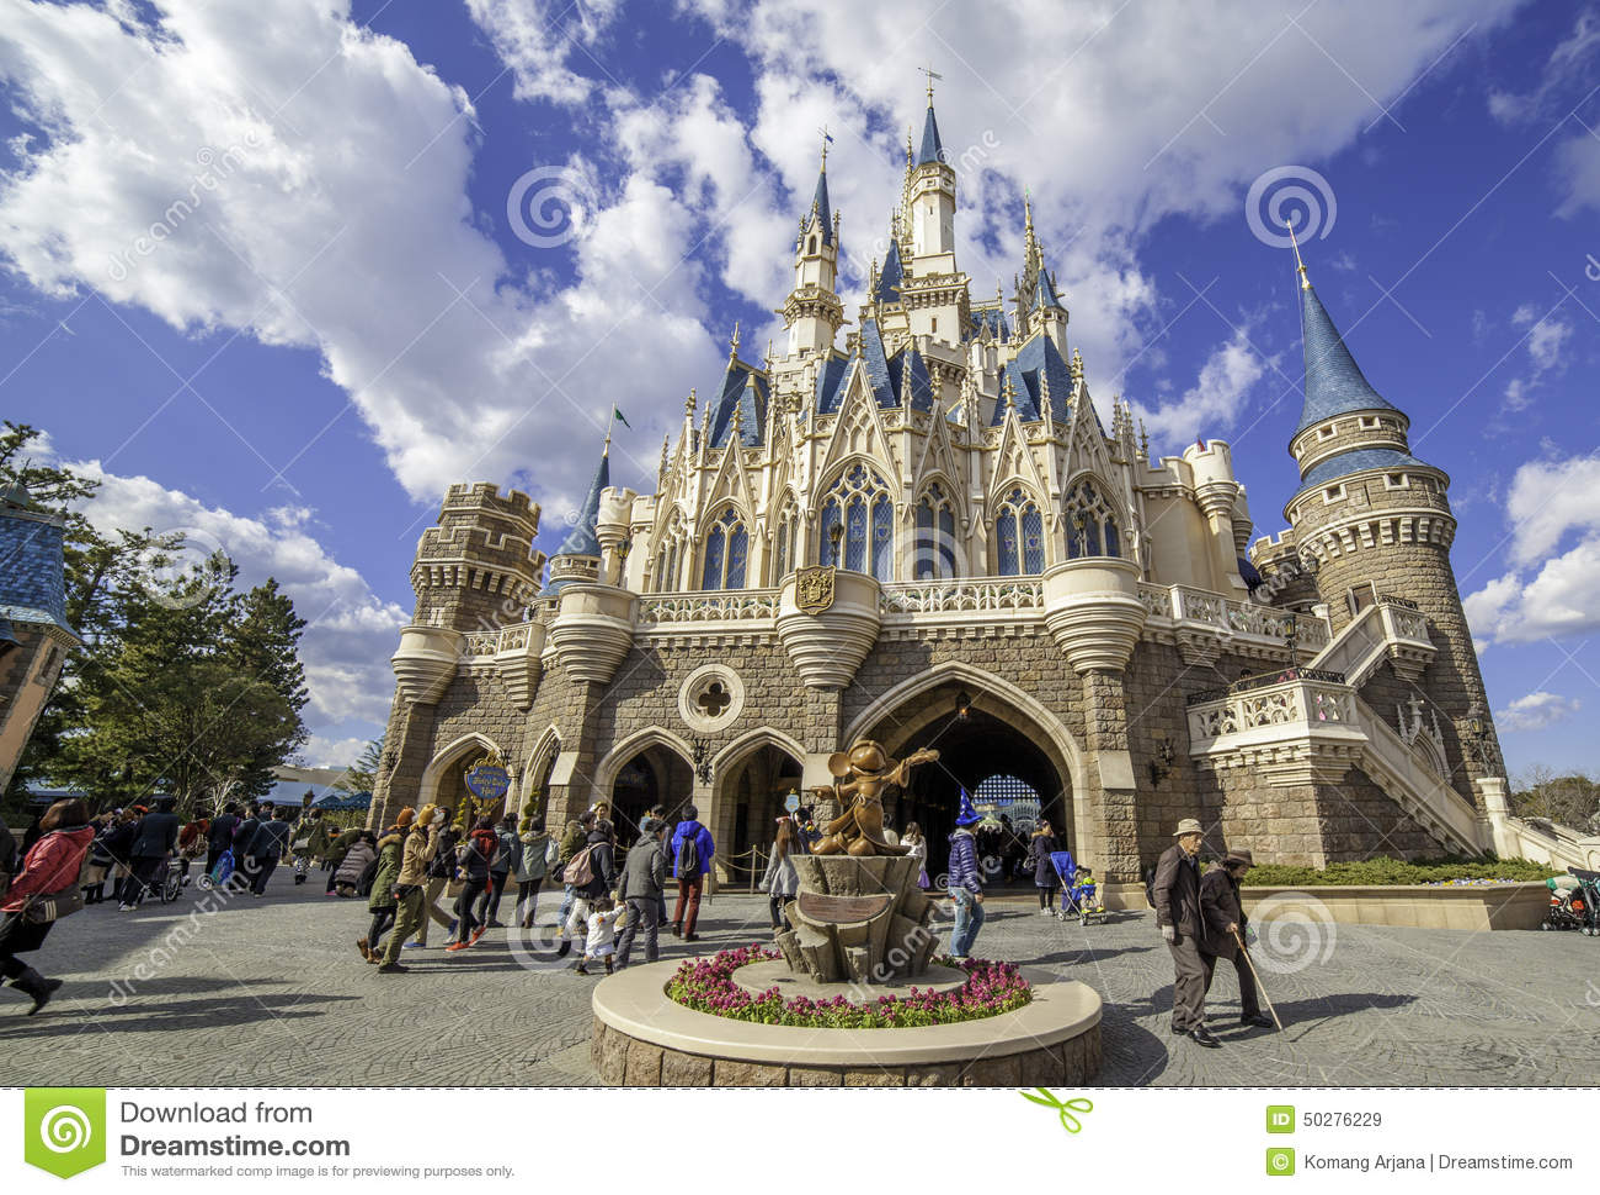 Castillo de Tokio Disneylandya